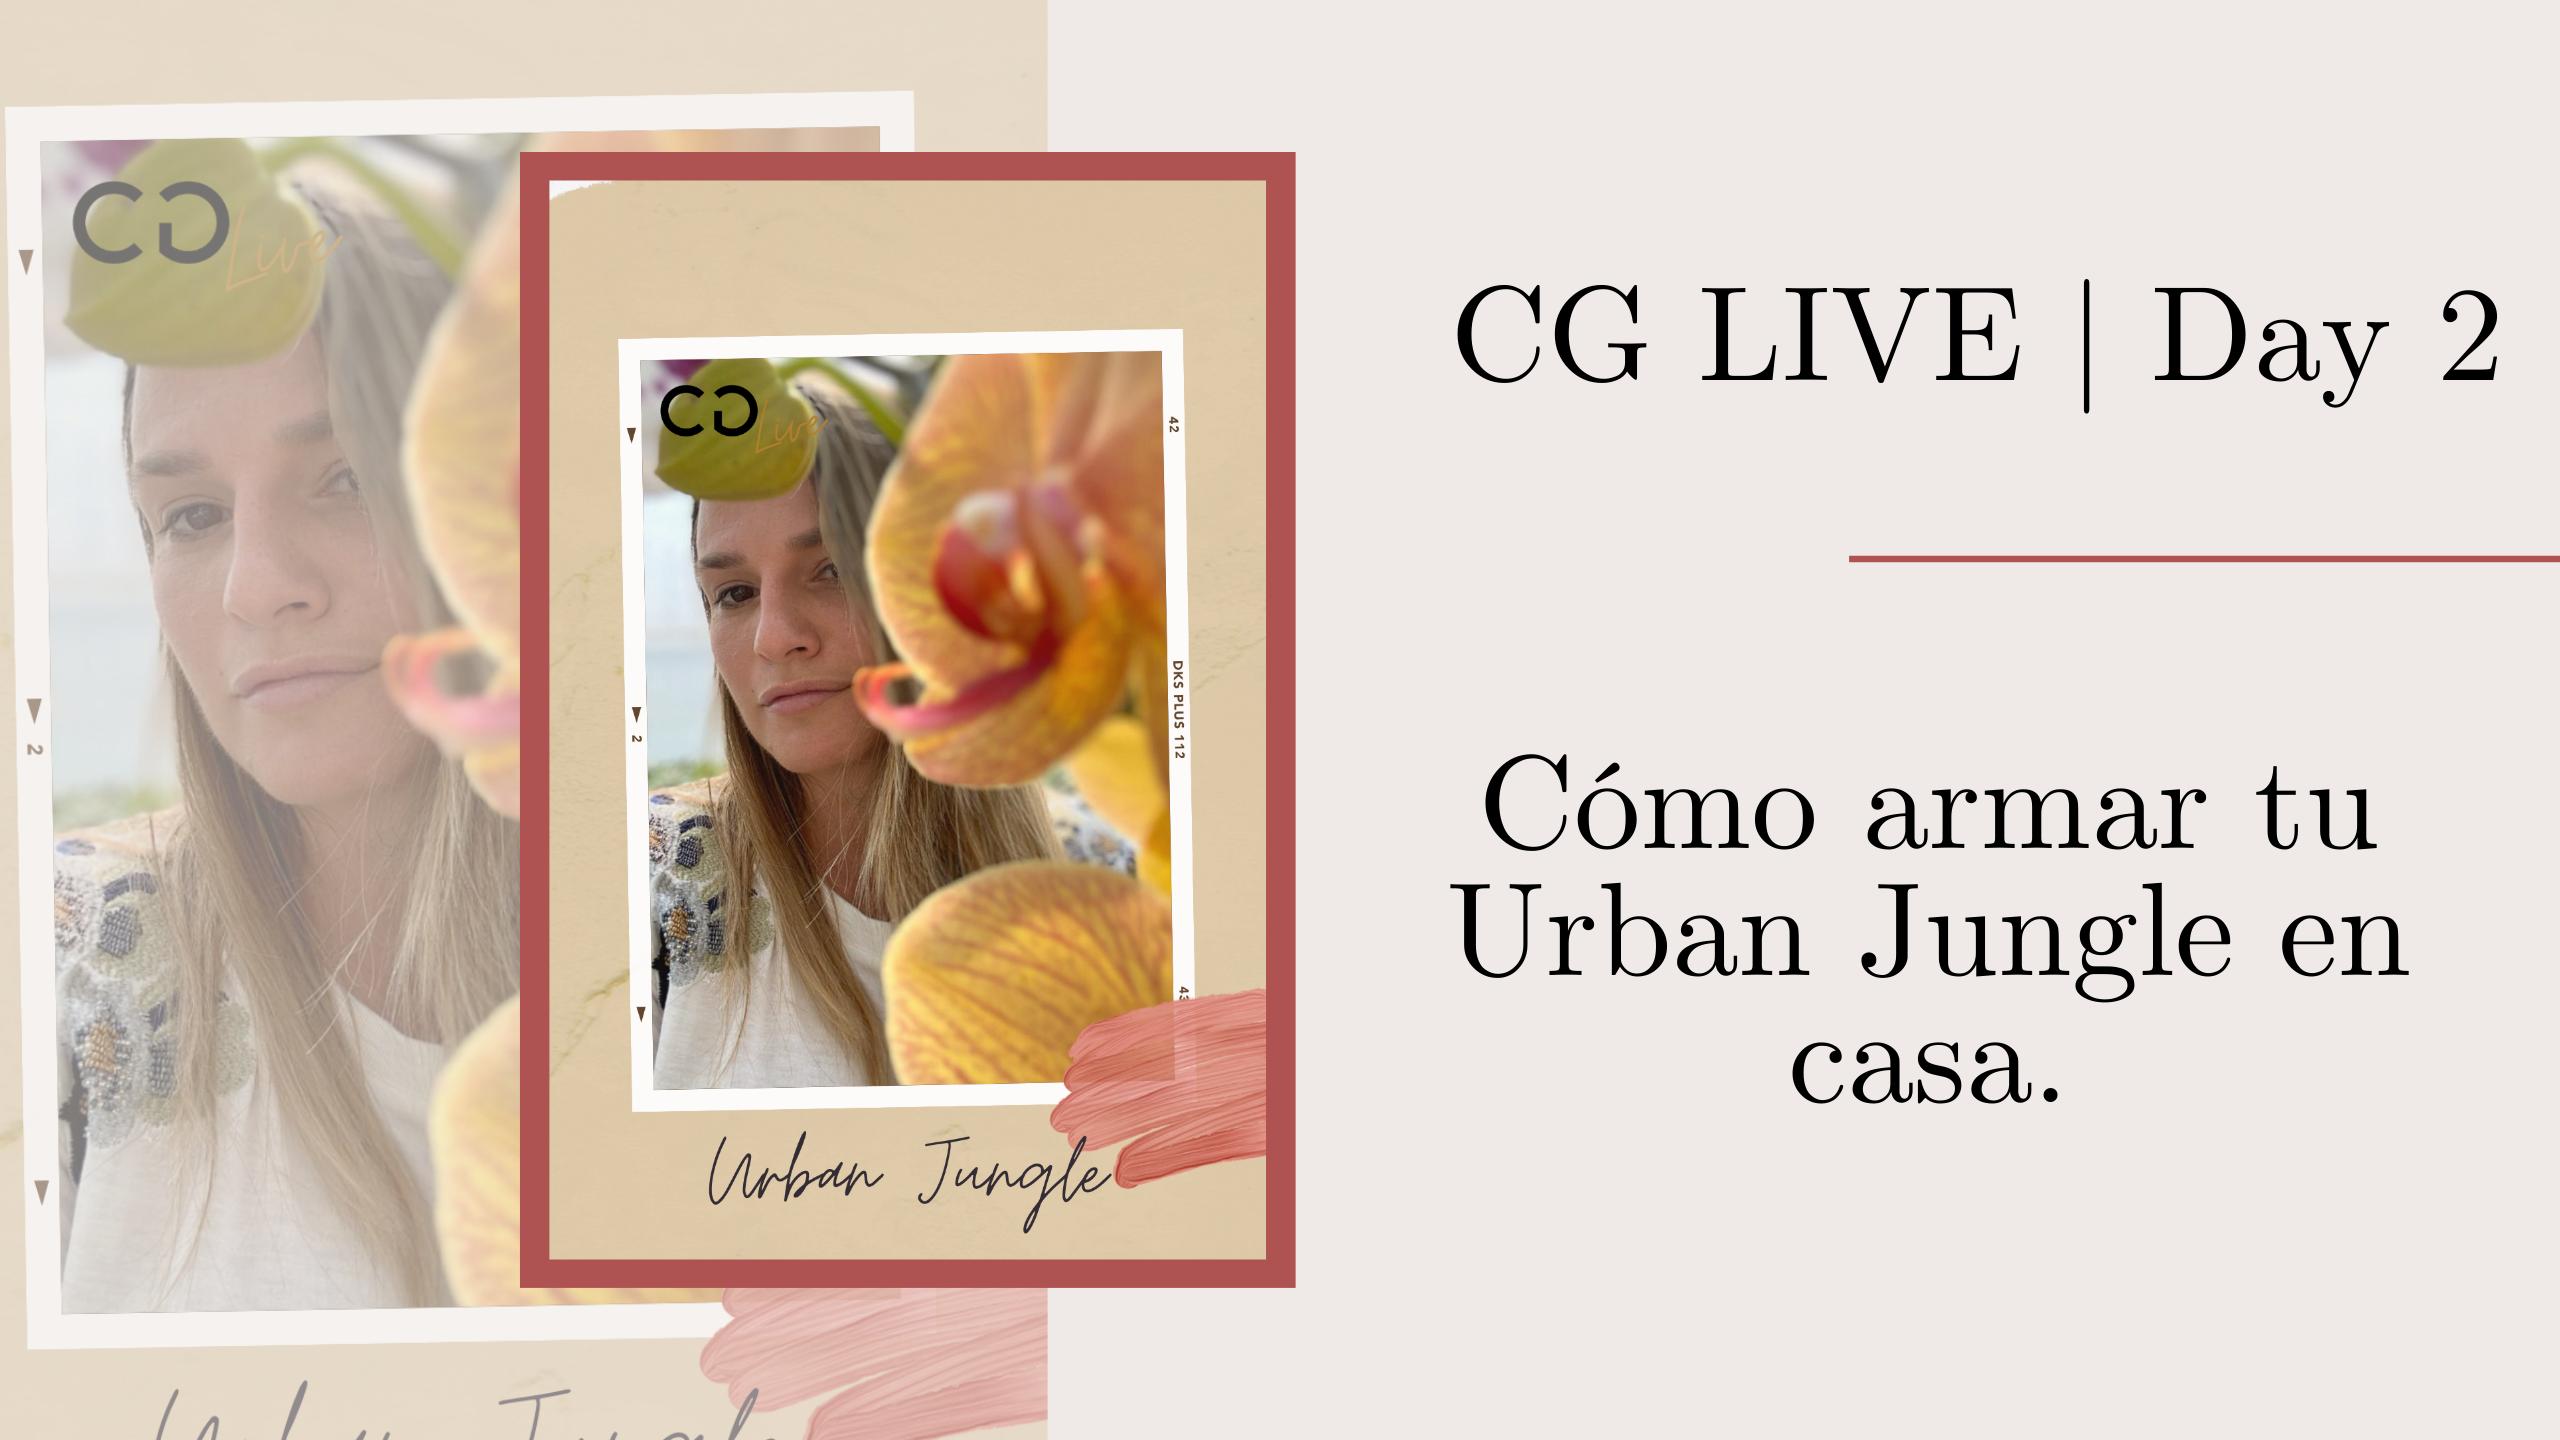 CG Live | Day 2: Armá tu Urban Jungle en casa